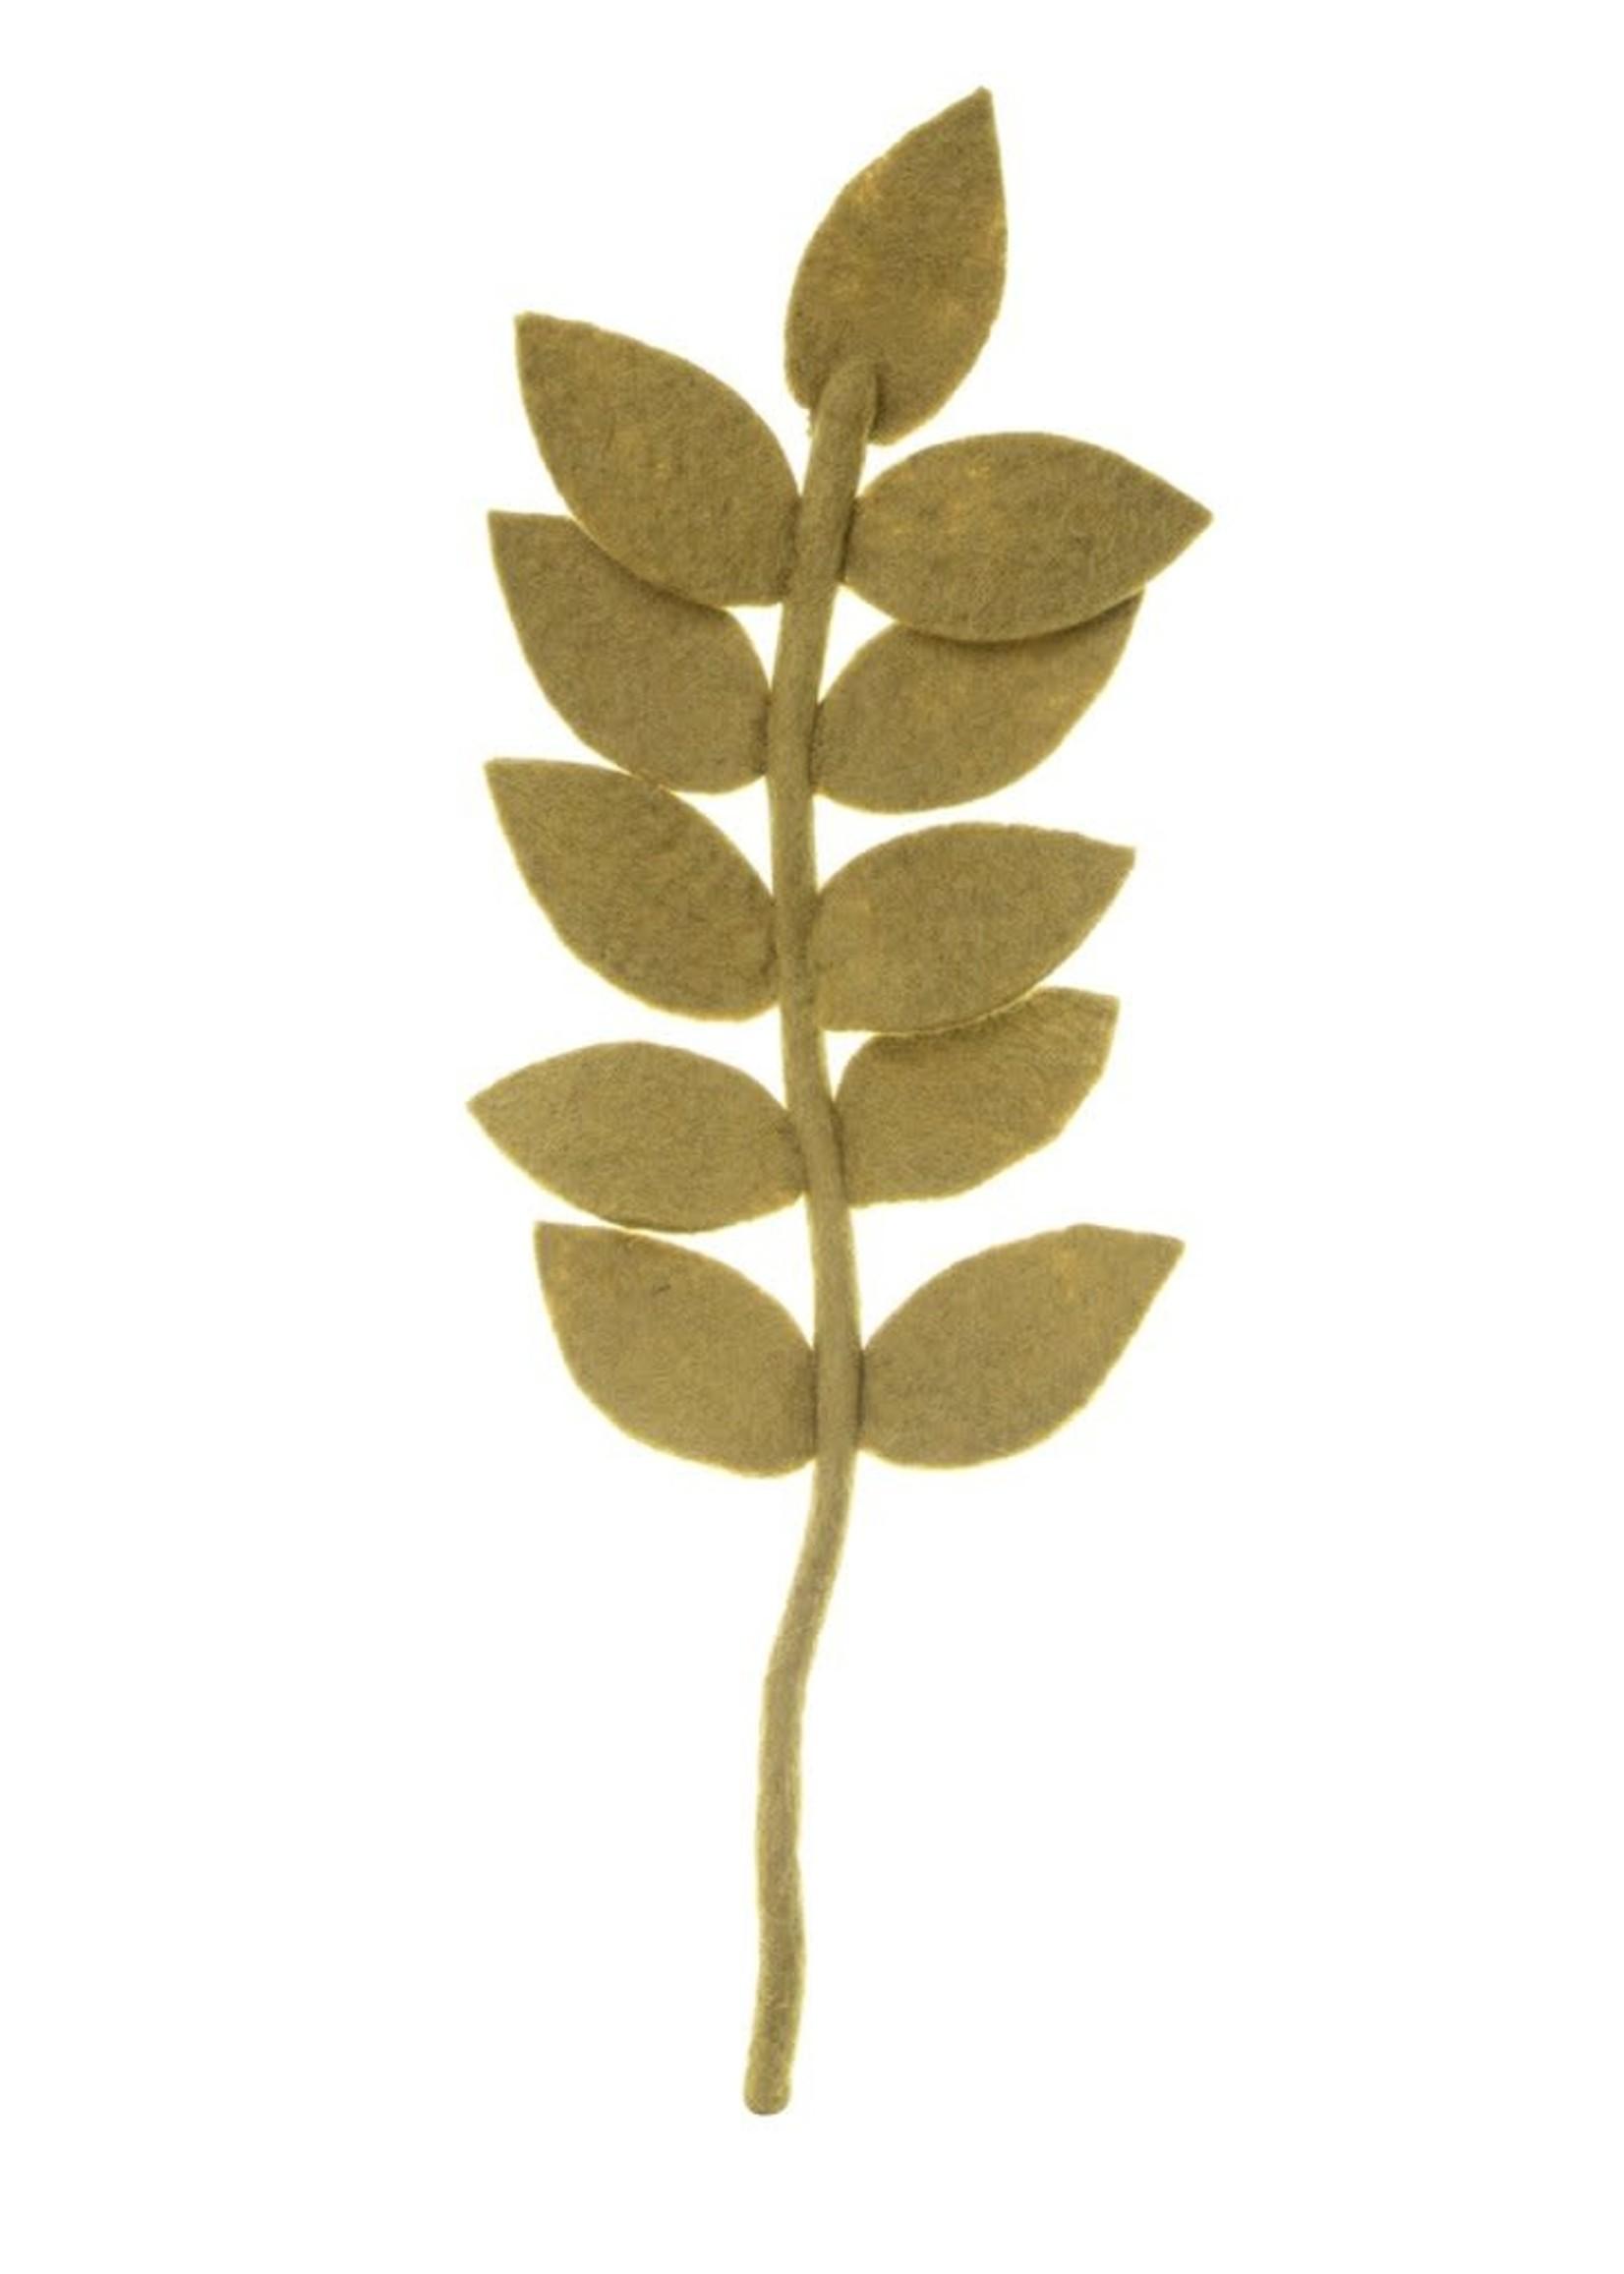 Global Goods Partners Felt Harvest Leaf